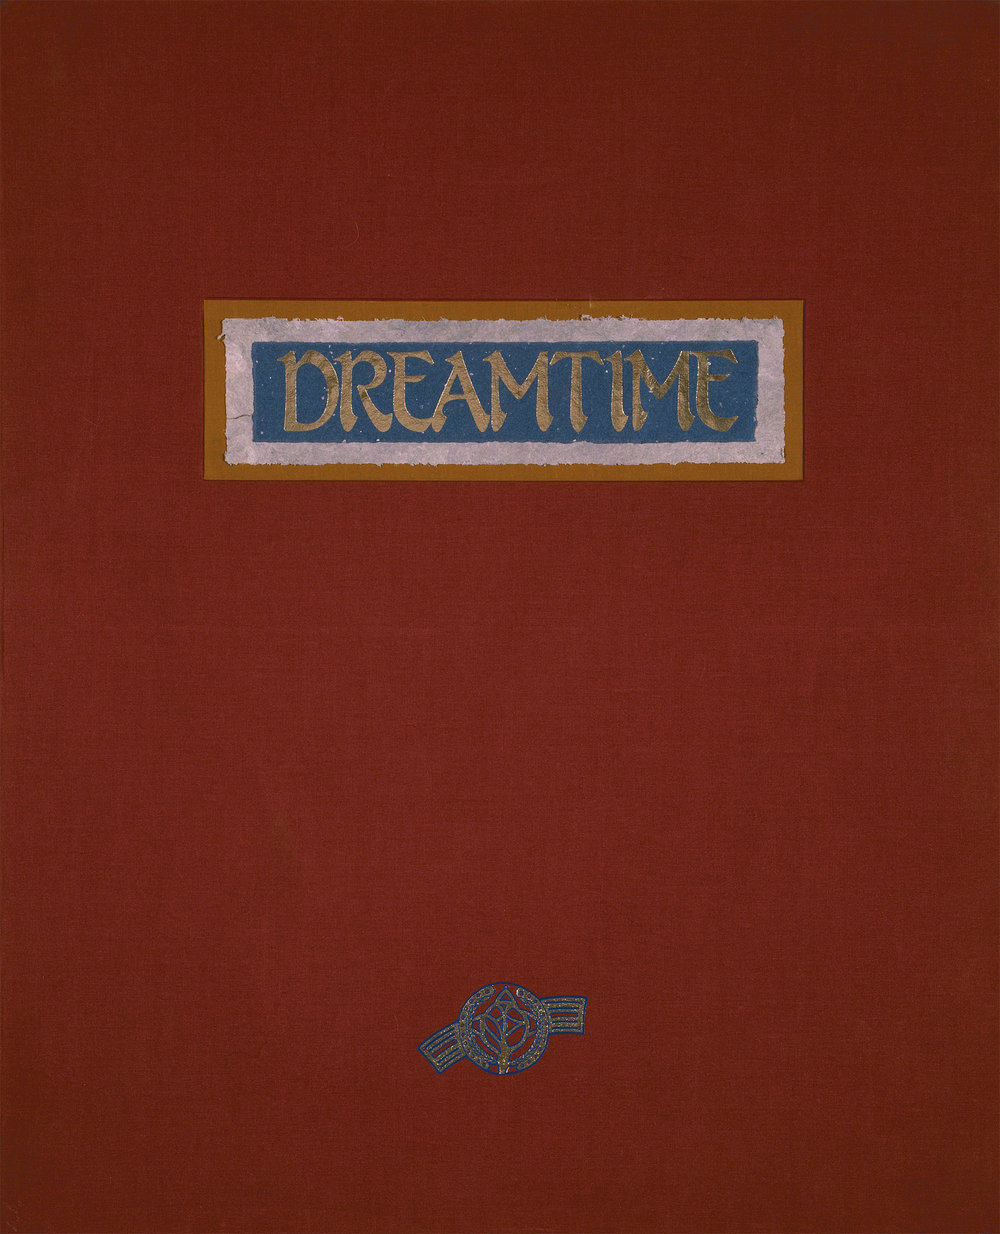 Dreamtime Portfolio